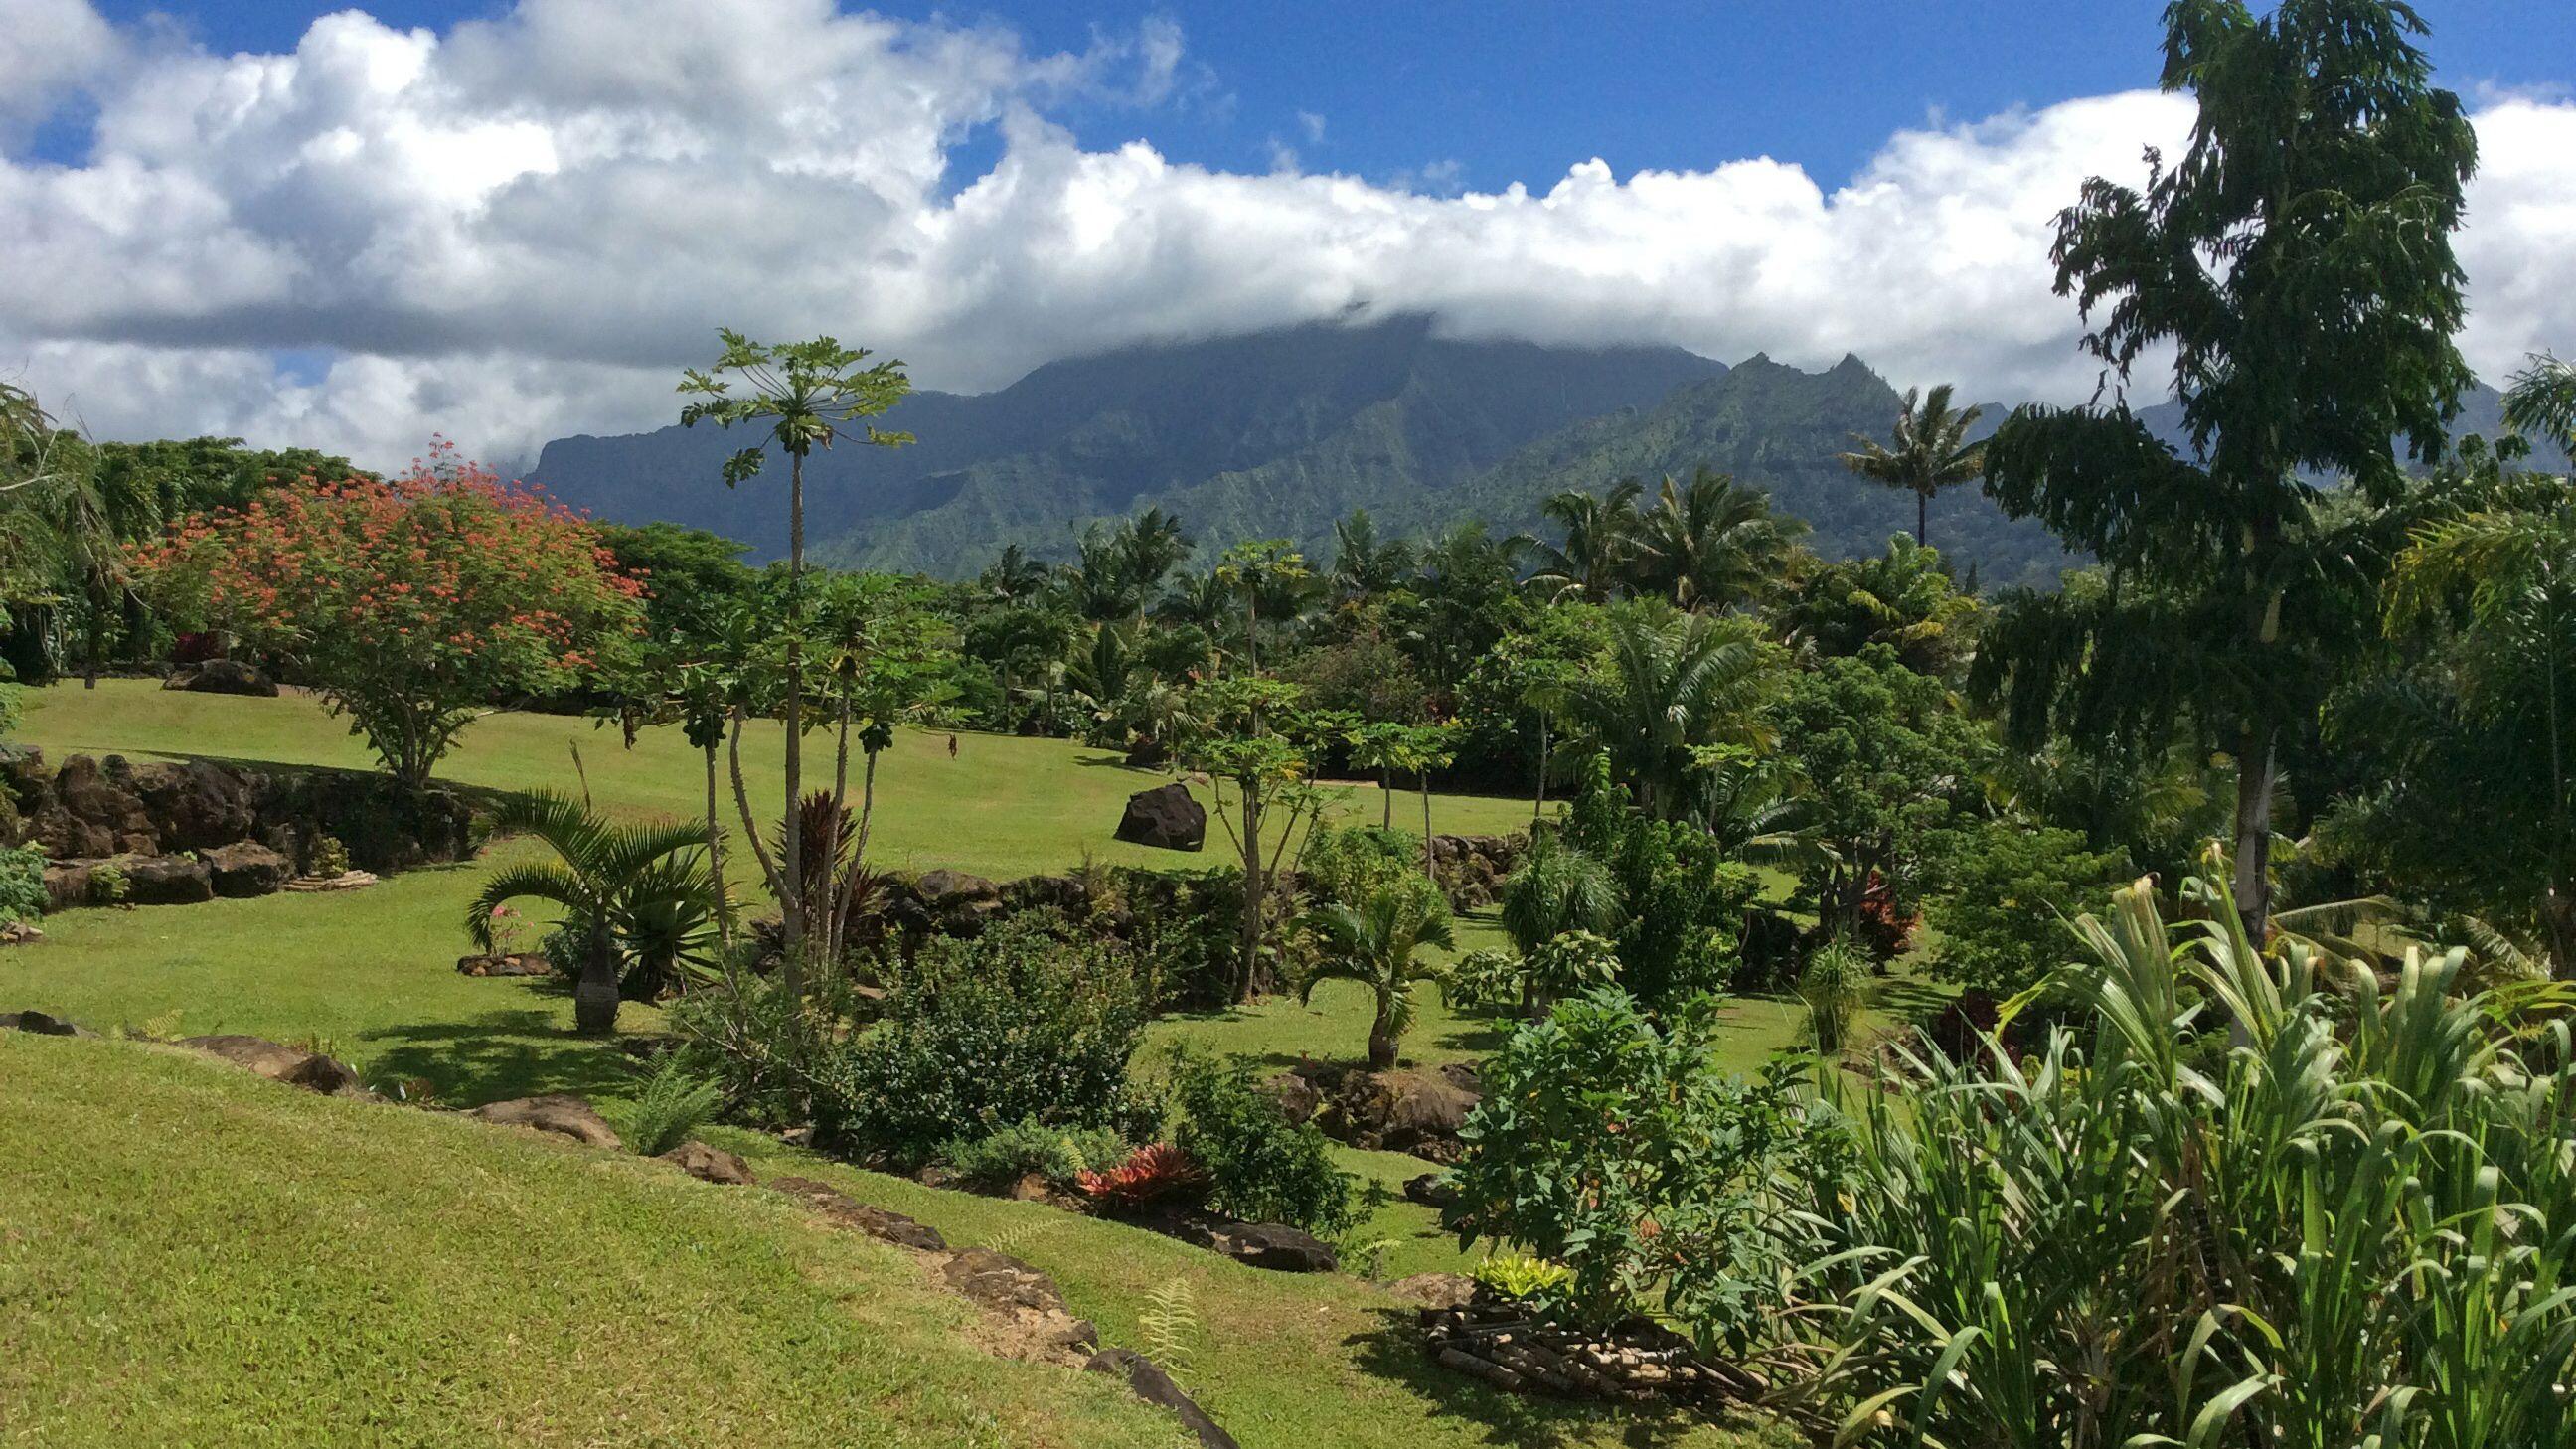 Garden view in Kauai